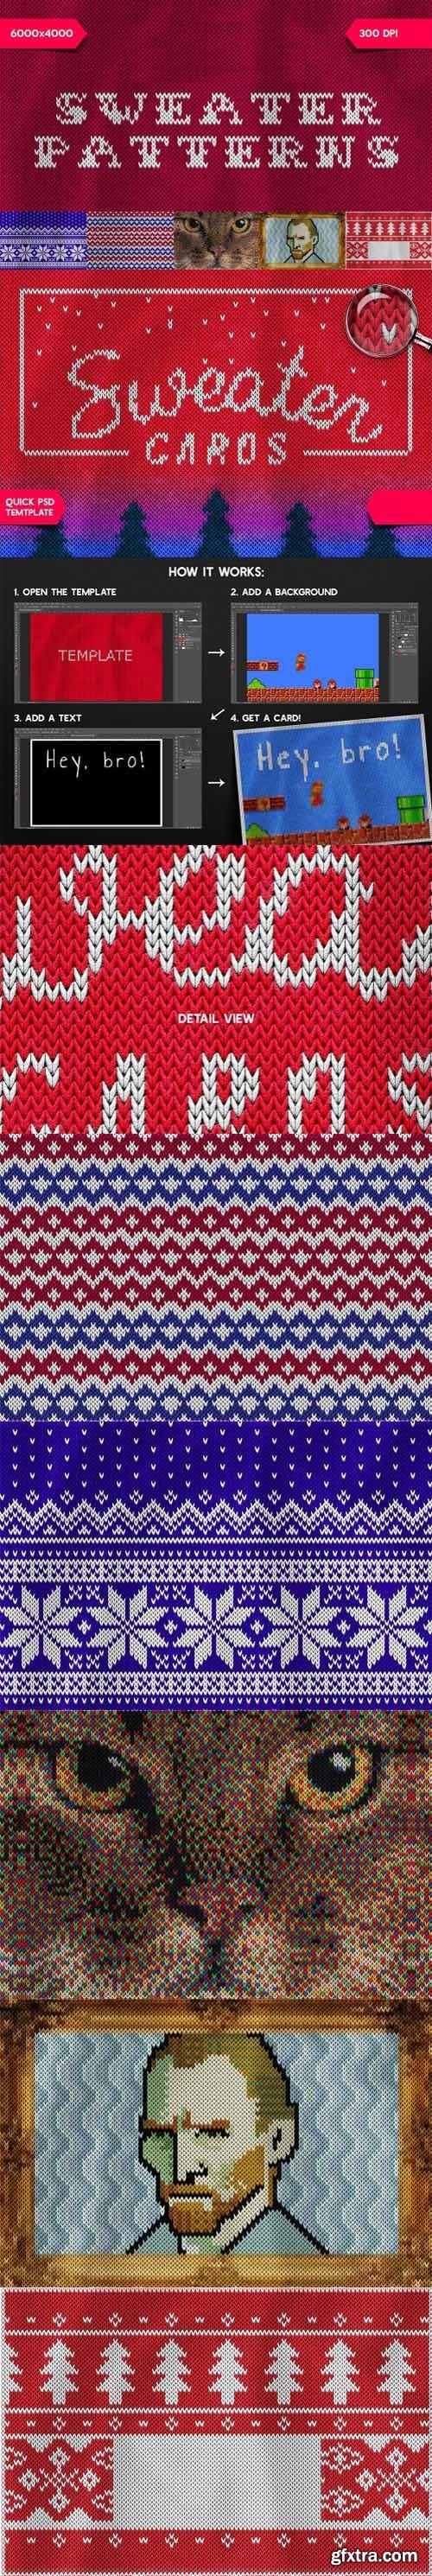 5 Christmas Sweater Patterns